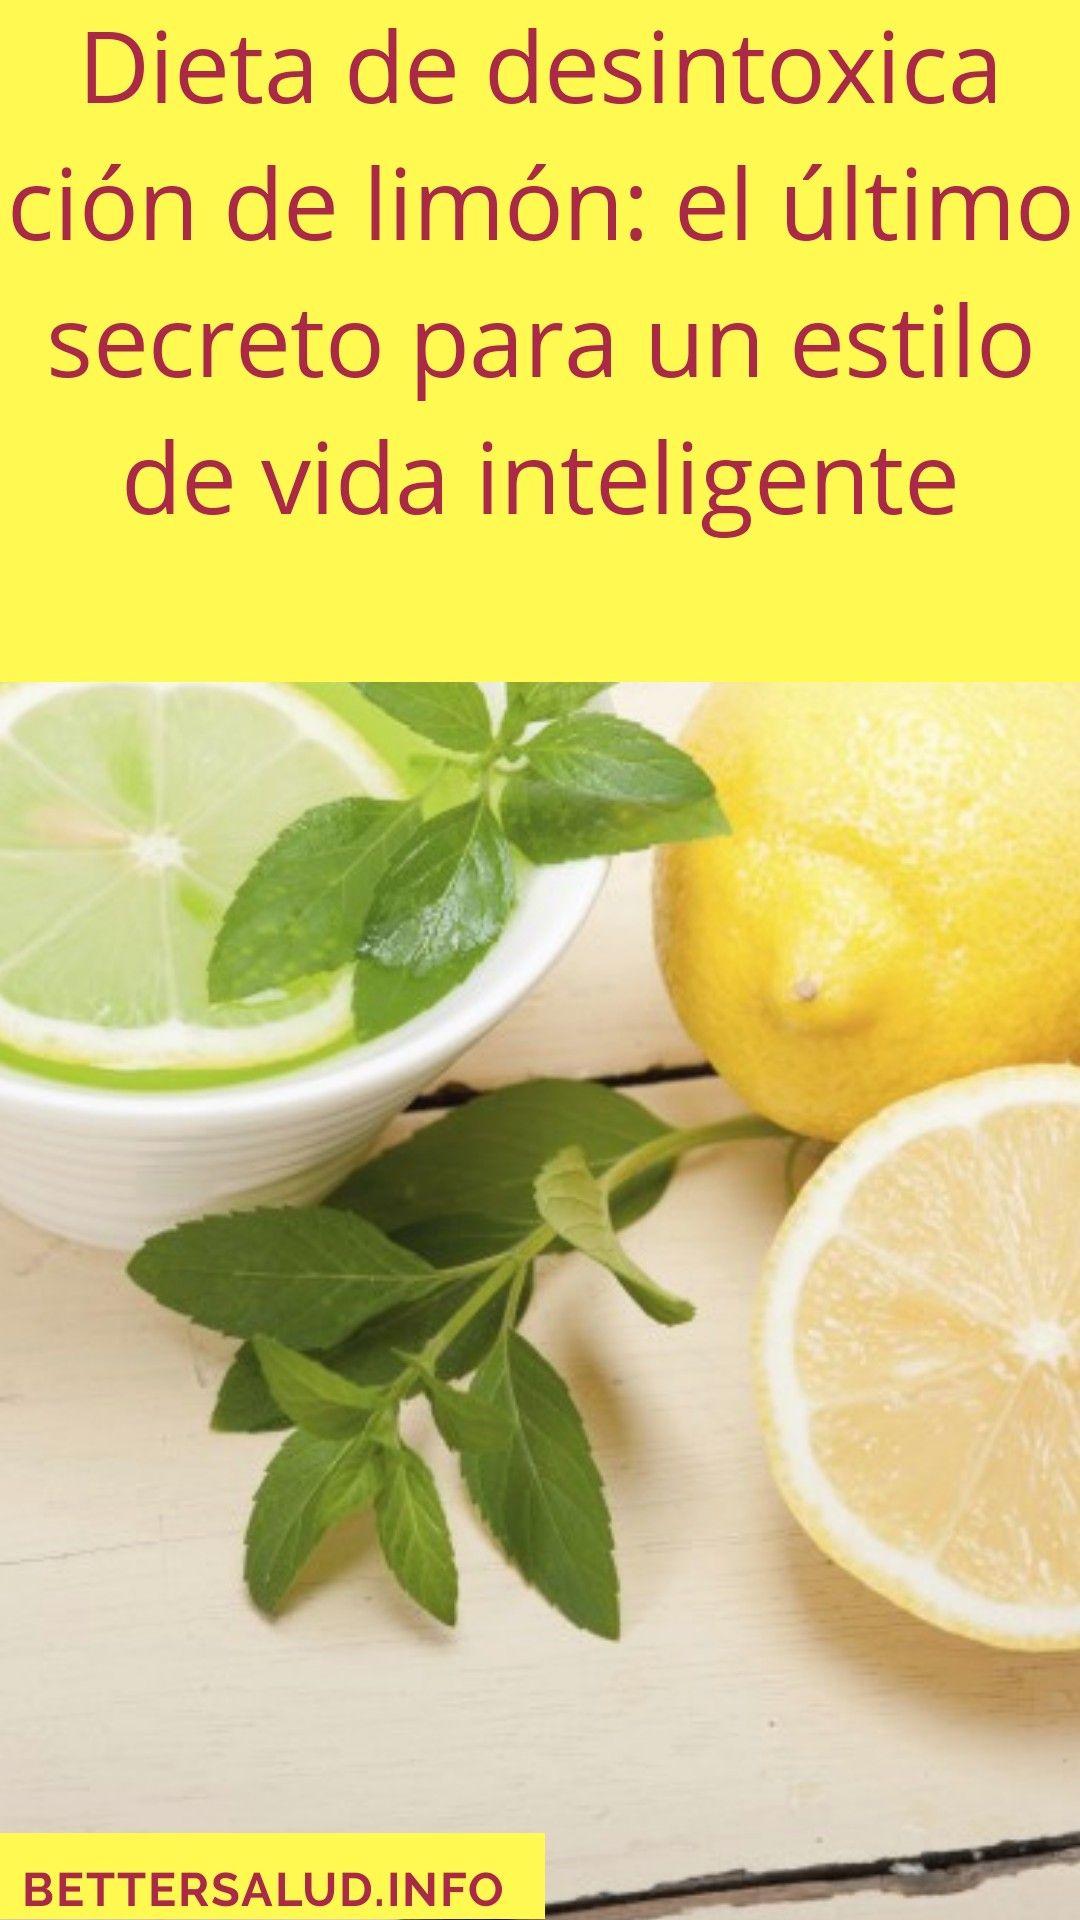 Dieta De Desintoxicacion De Limon El Ultimo Secreto Para Un Estilo De Vida Inteligente Dieta Limon Salud Adelgazar Fruit Food Lime